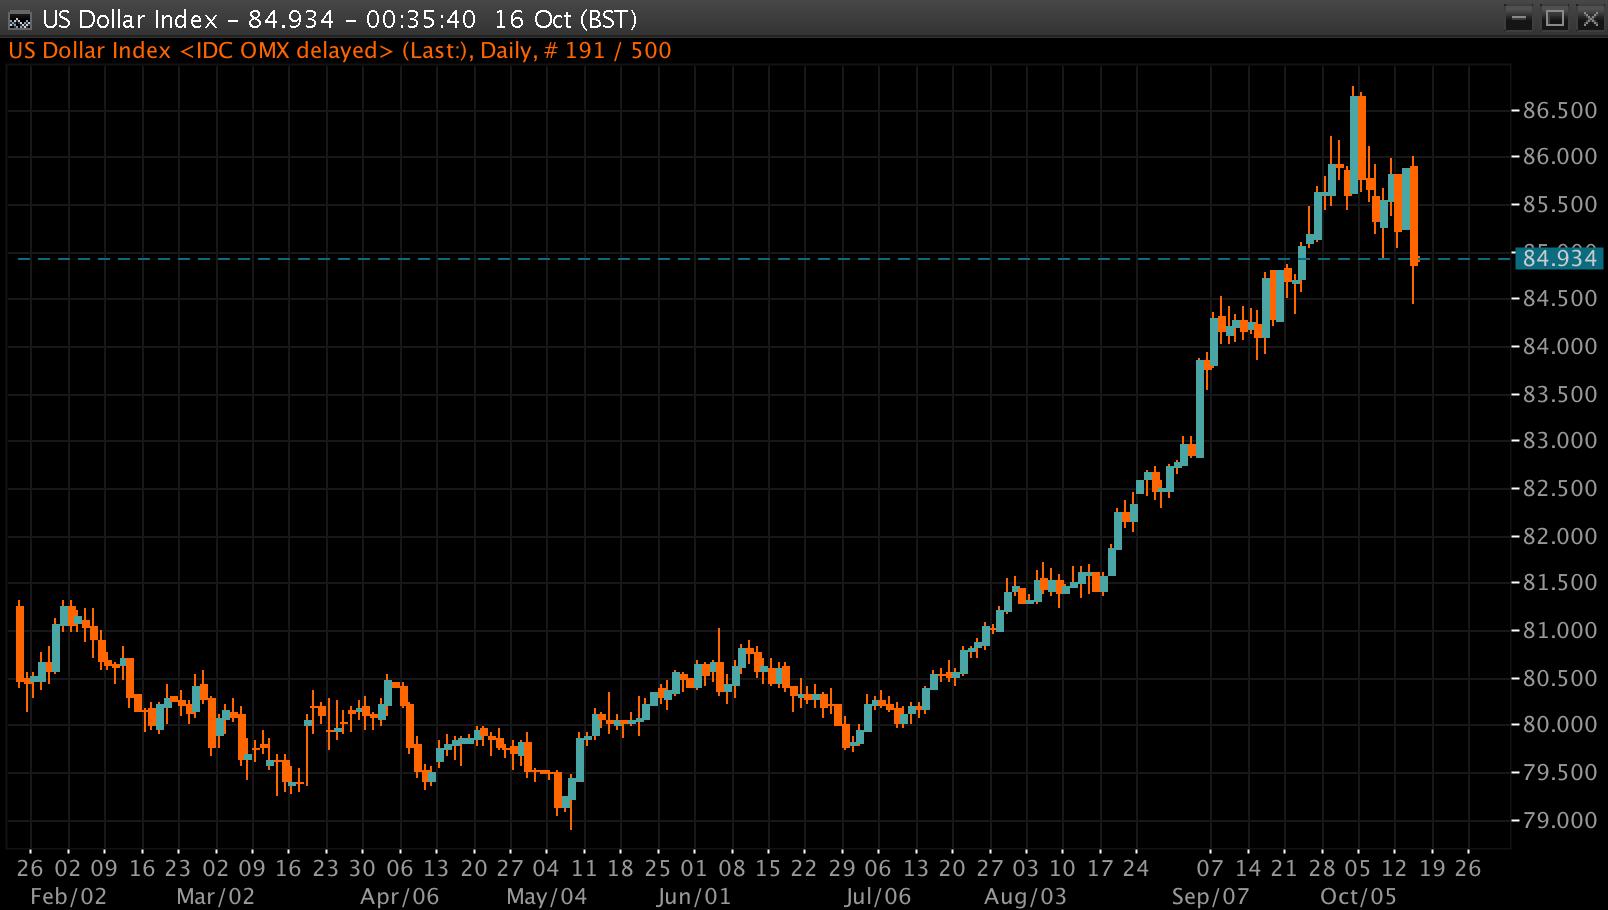 Usdx chart mt4 форум рынки форекс